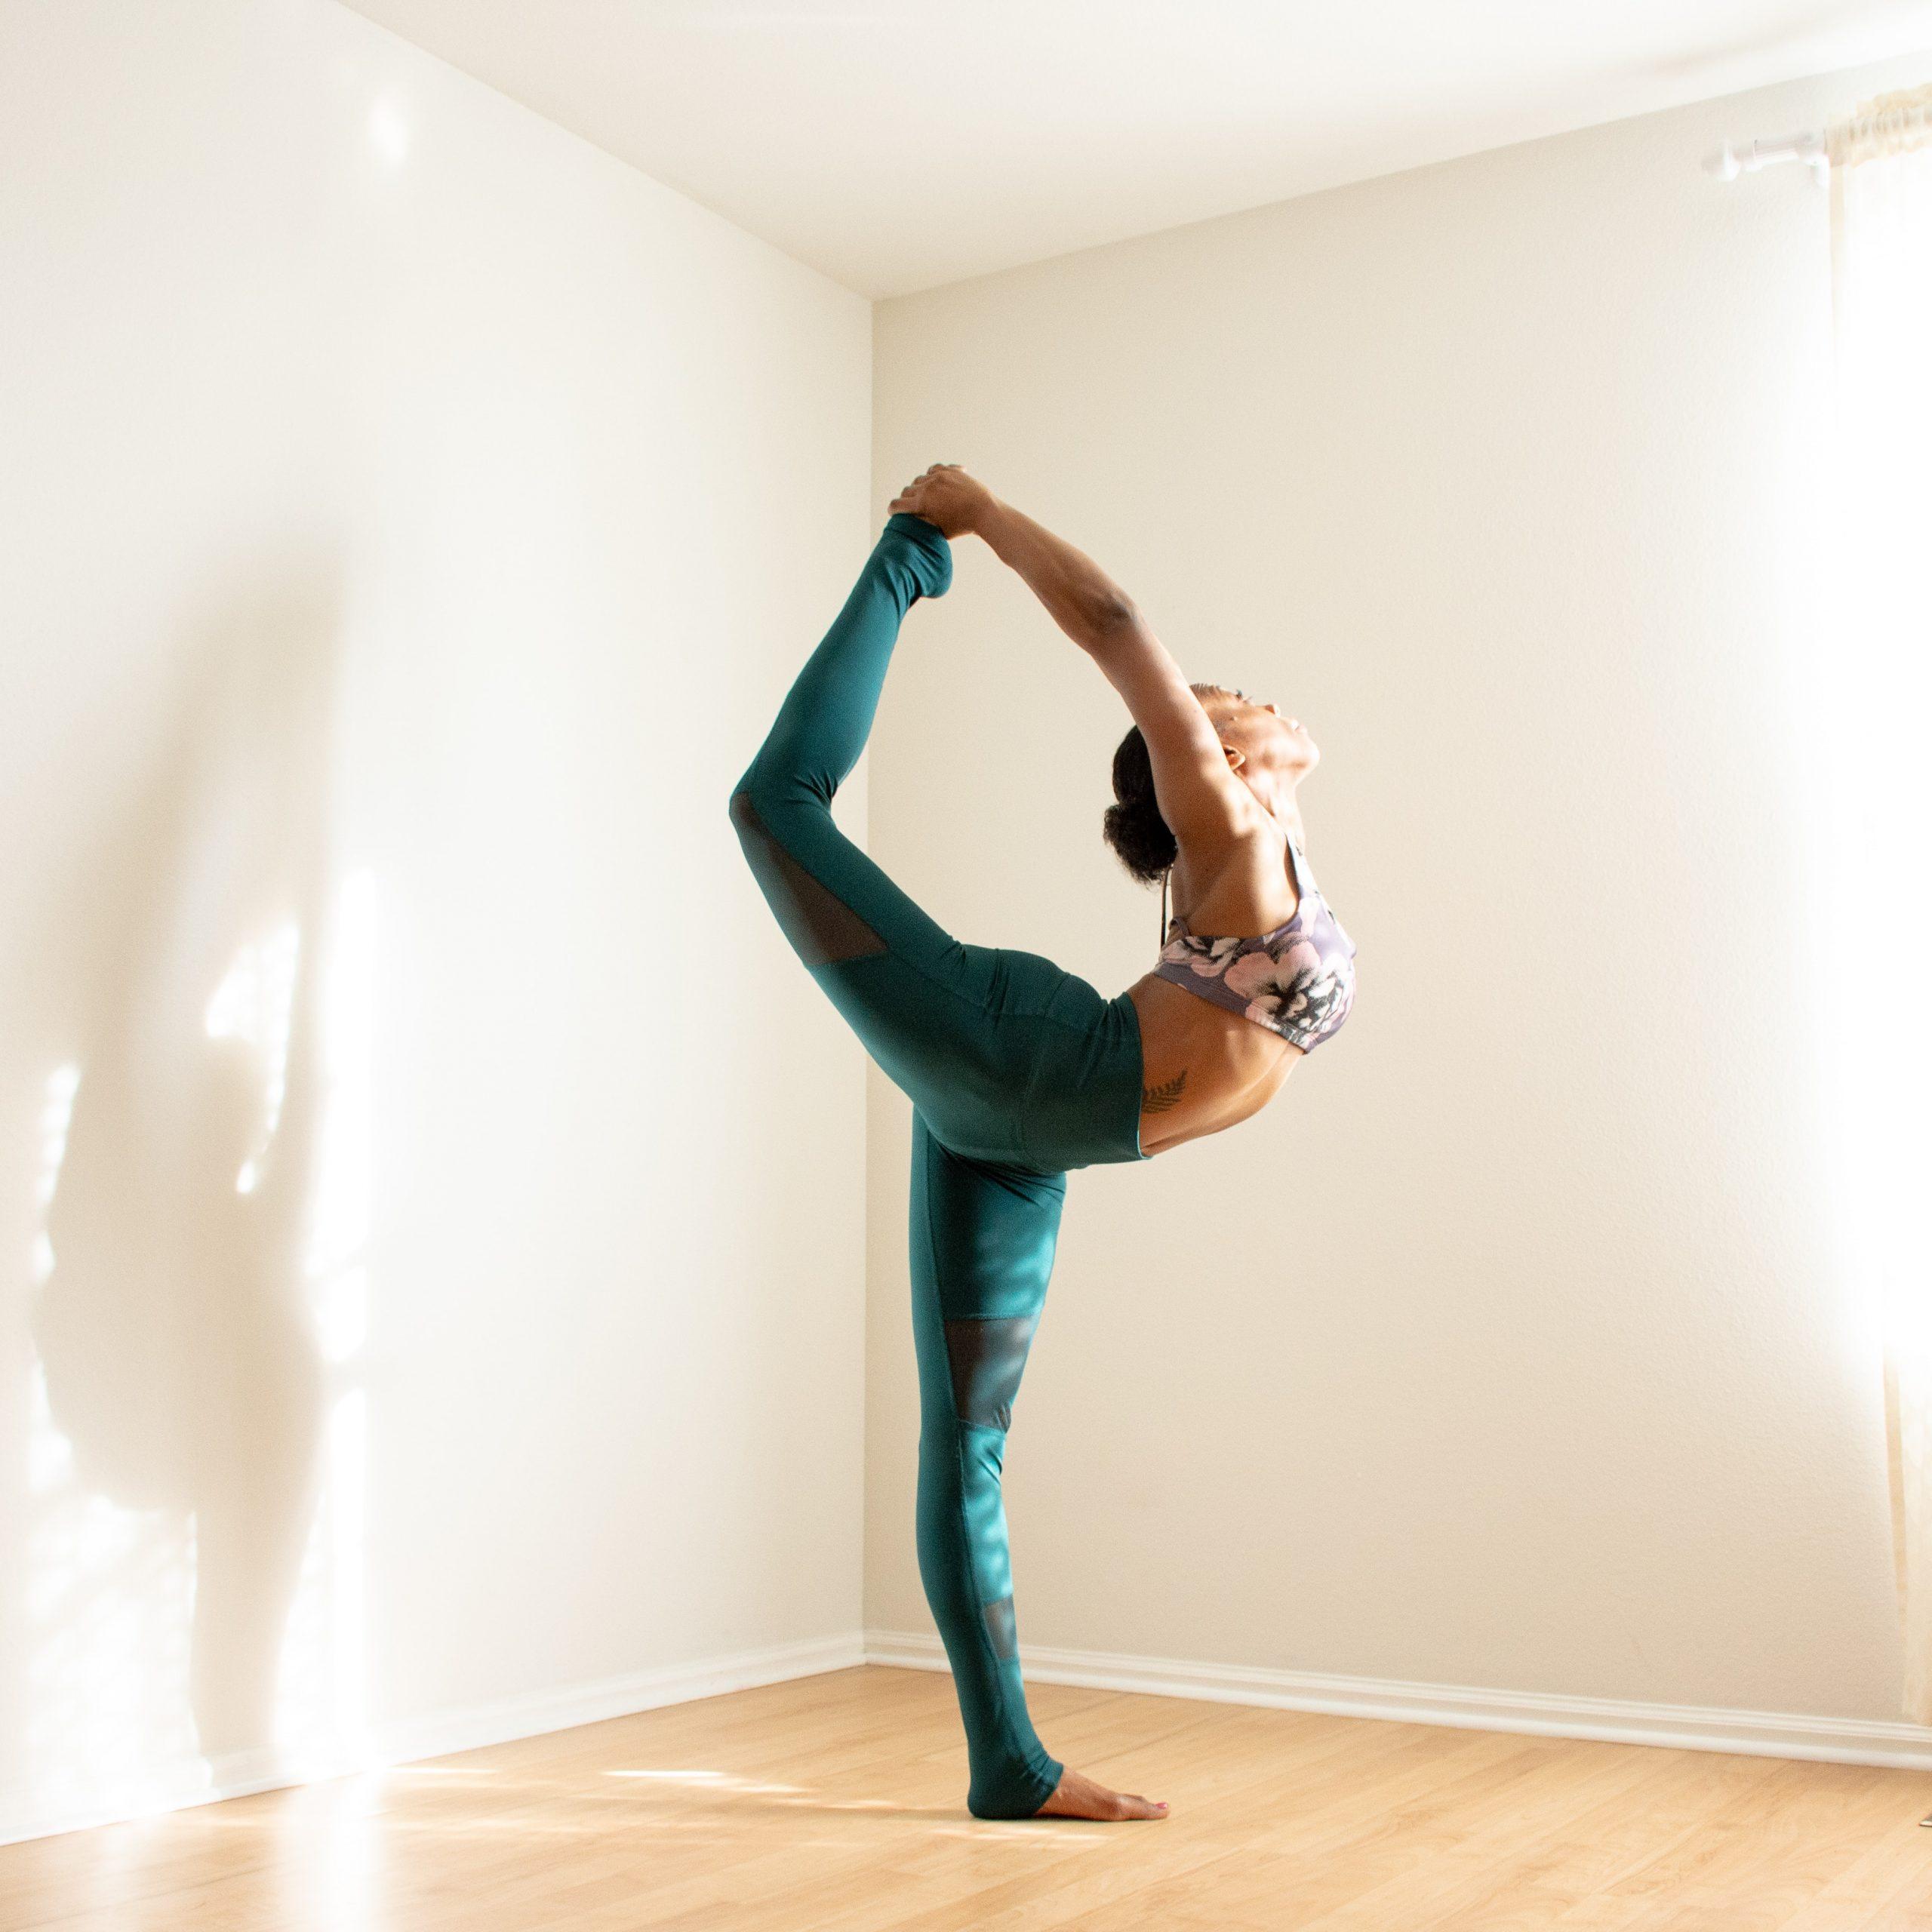 Flexible bidding